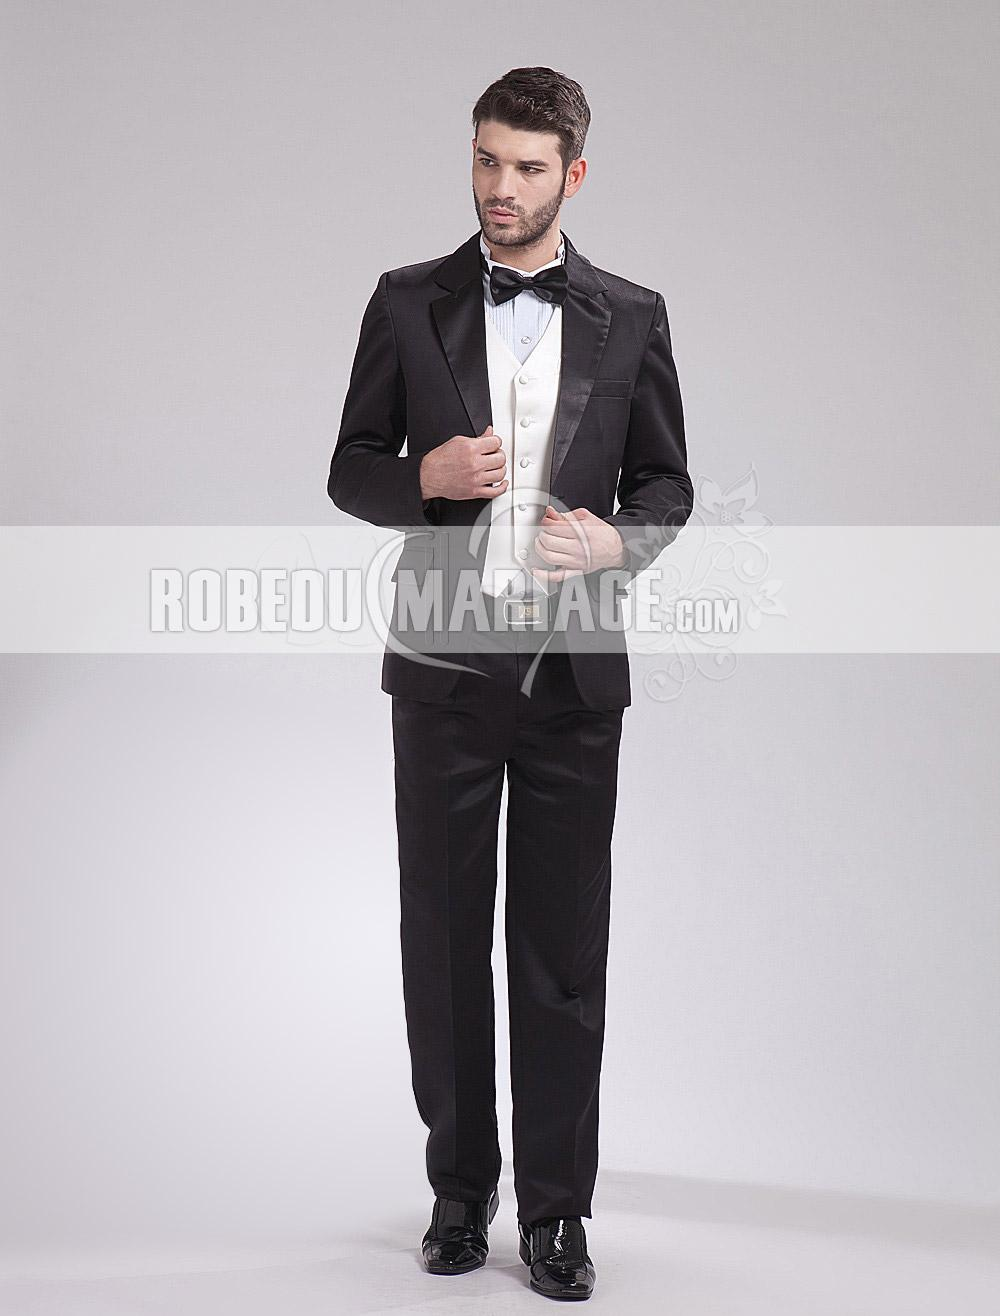 costume de mariage moderne costume de style simple robe207310. Black Bedroom Furniture Sets. Home Design Ideas